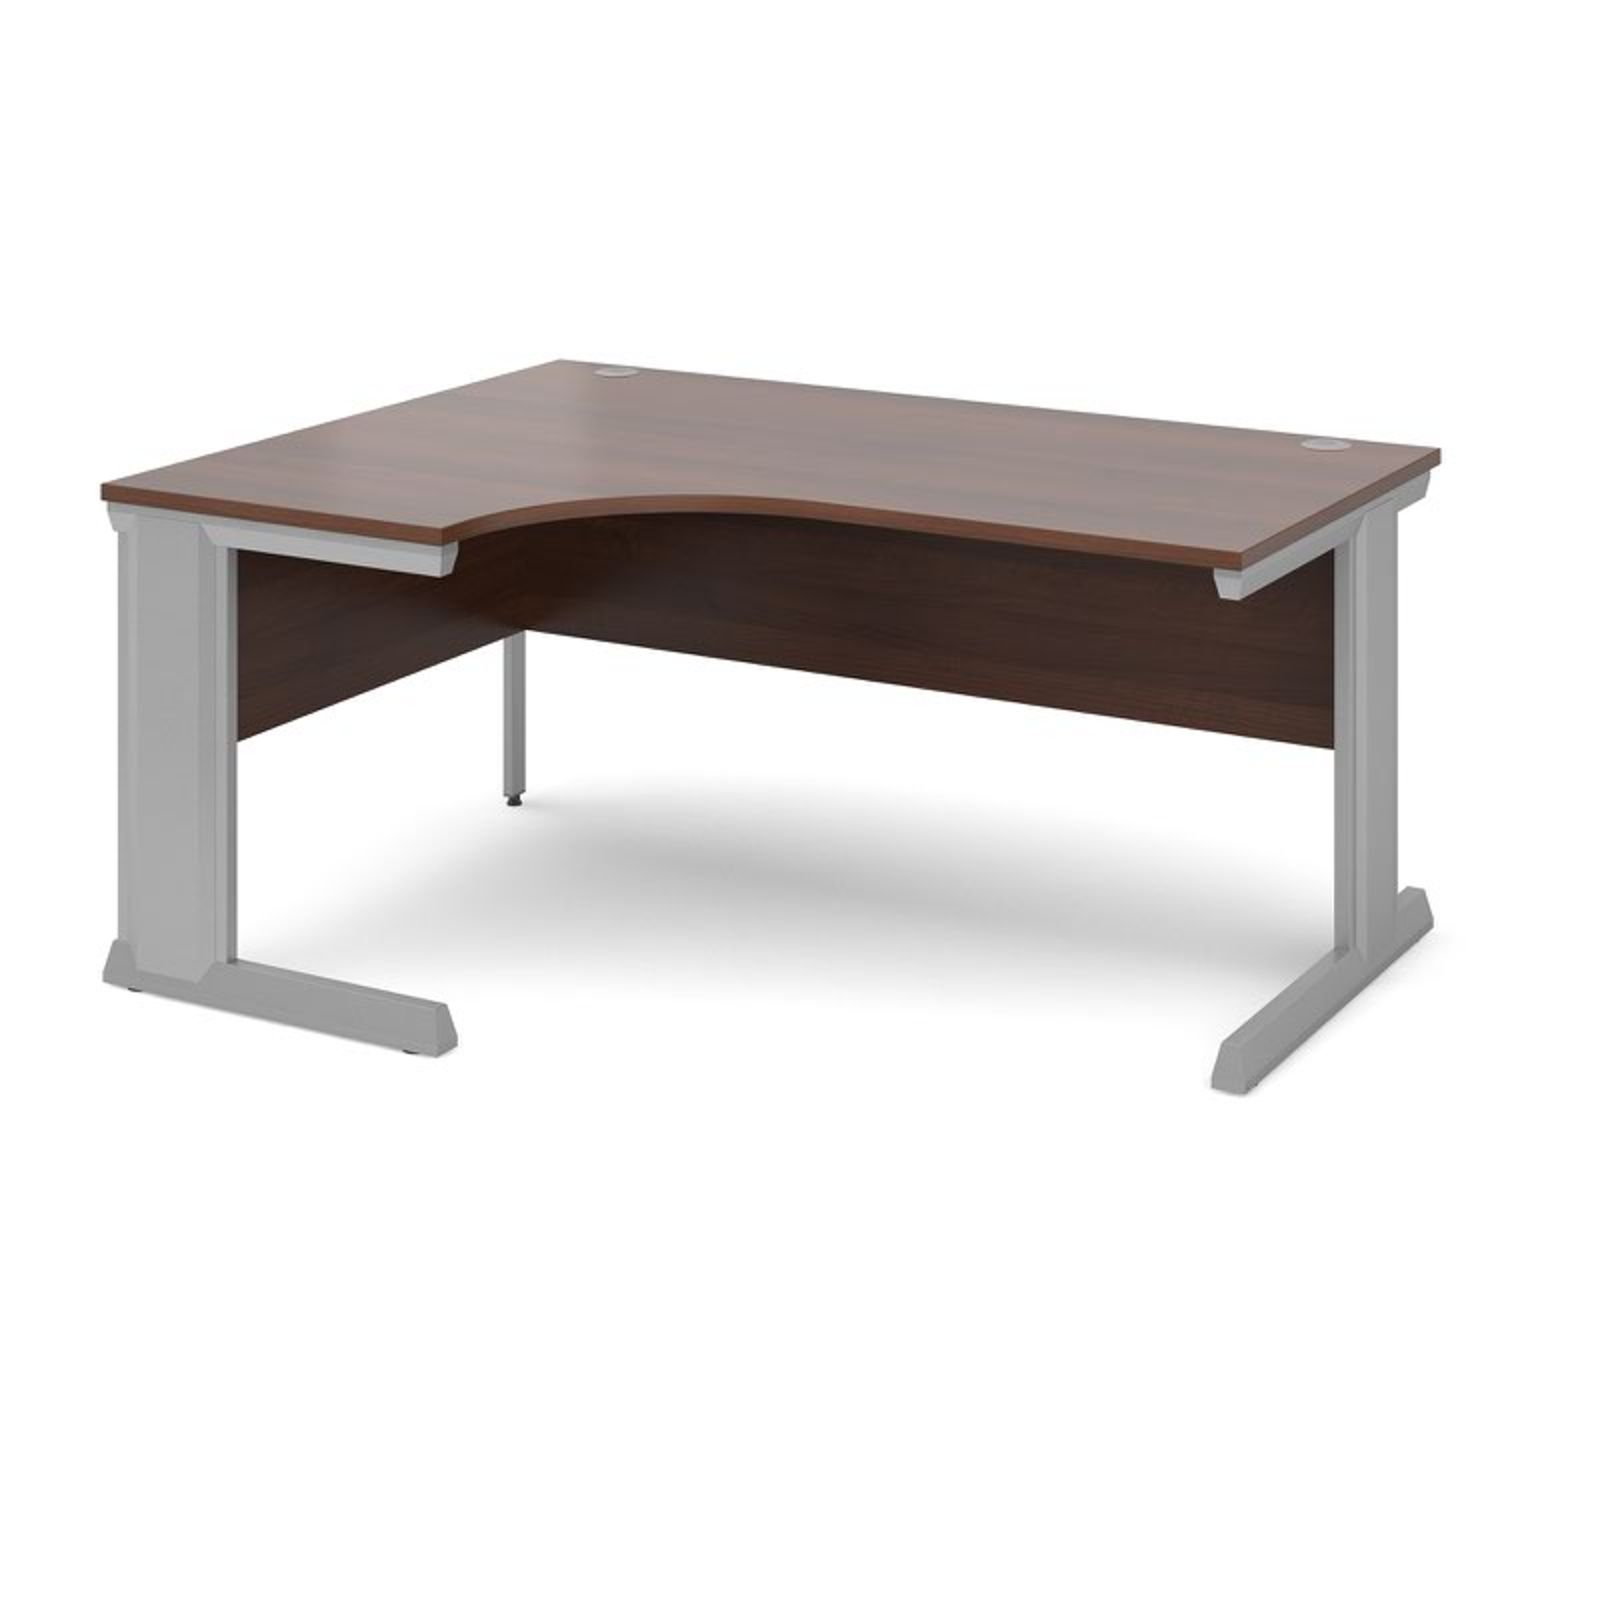 Compare prices for Vivo Left Hand Ergonomic Desk 1600mm - Silver Frame Walnut Top